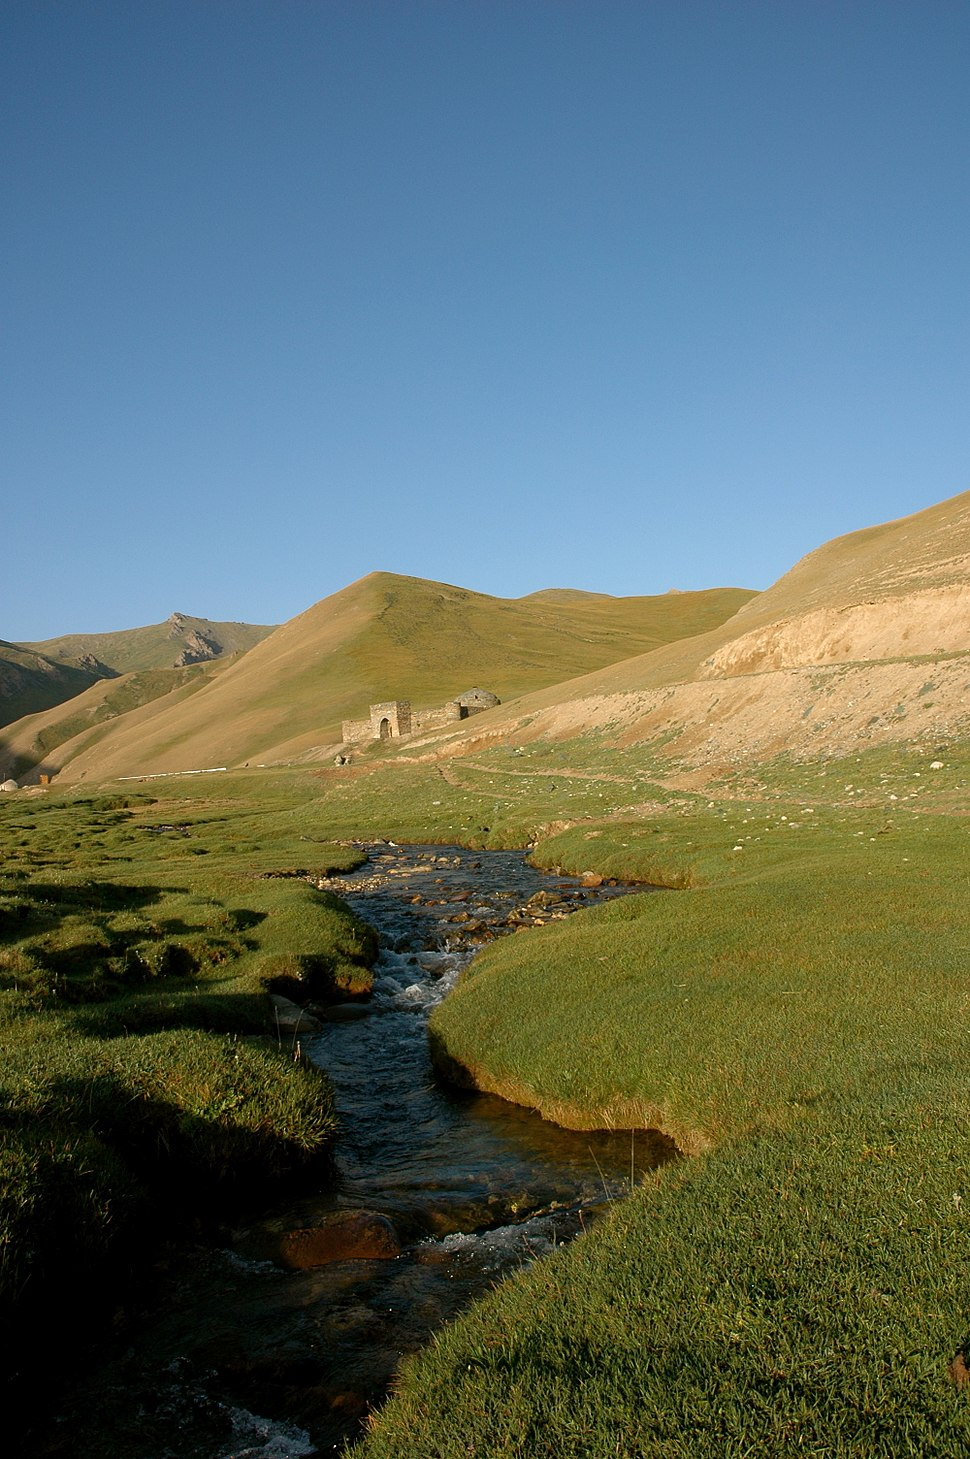 Caravanserai Tash Rabat on Silk Road in Kyrgyzstan